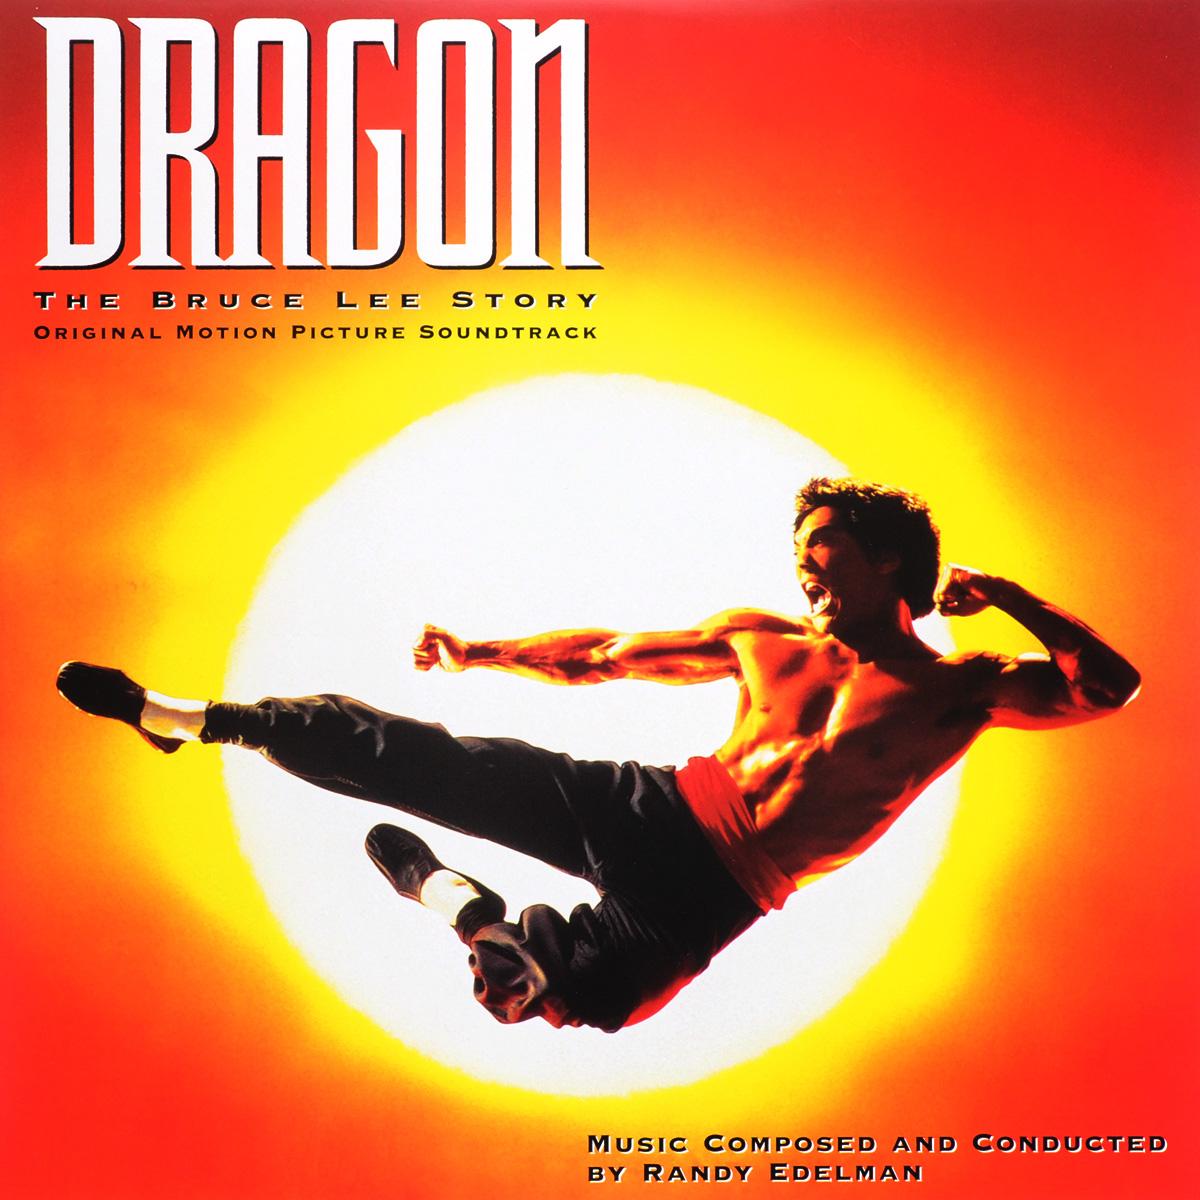 Lynn Ray,Xiao Fen Min Randy Edelman. Dragon. The Bruce Lee Story. Original Motion Picture Soundtrack (LP) недорго, оригинальная цена